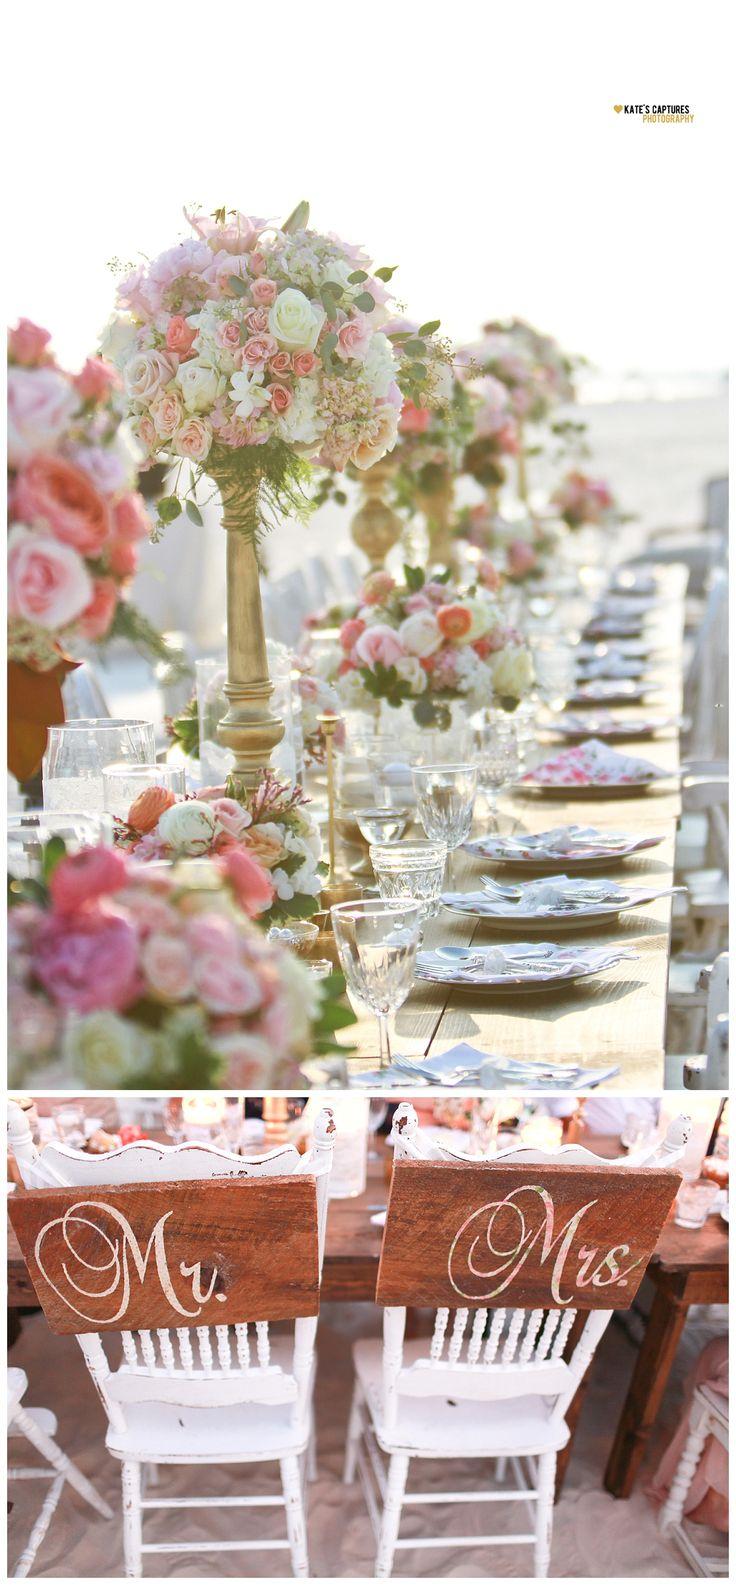 Beachside wedding reception table.